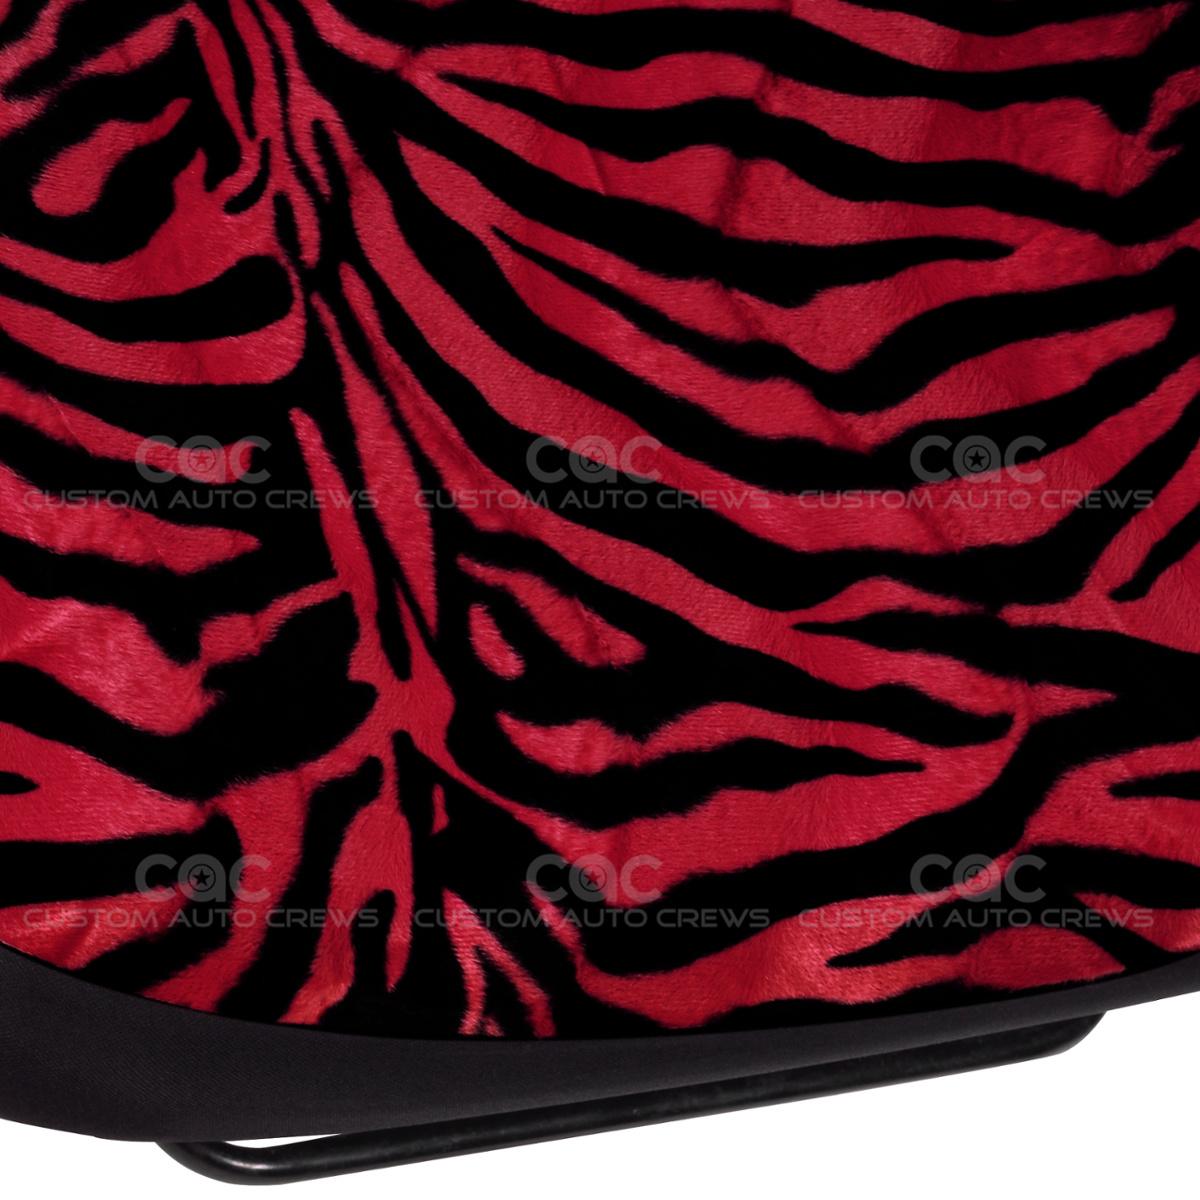 Zebra Print Seat Covers Set Pair 2pc High Back Bucket